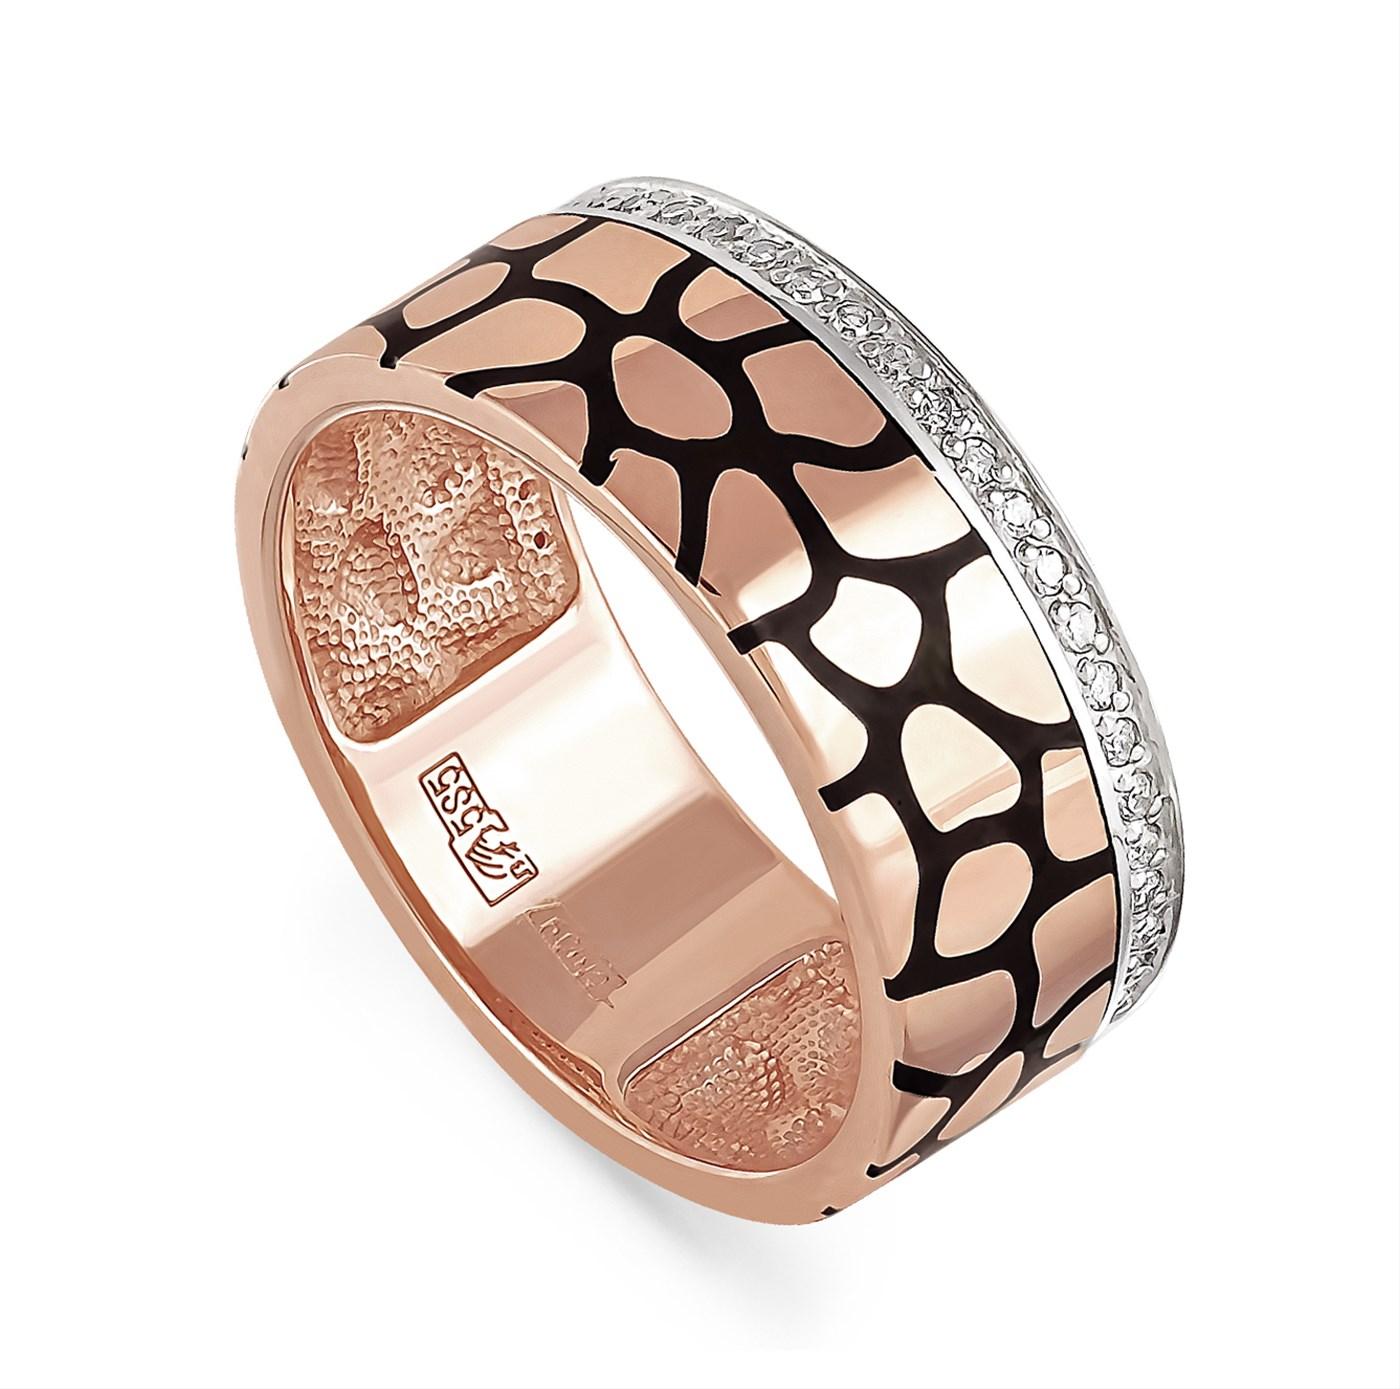 Золотое кольцо Бриллиант арт. 11-0709-1002 11-0709-1002